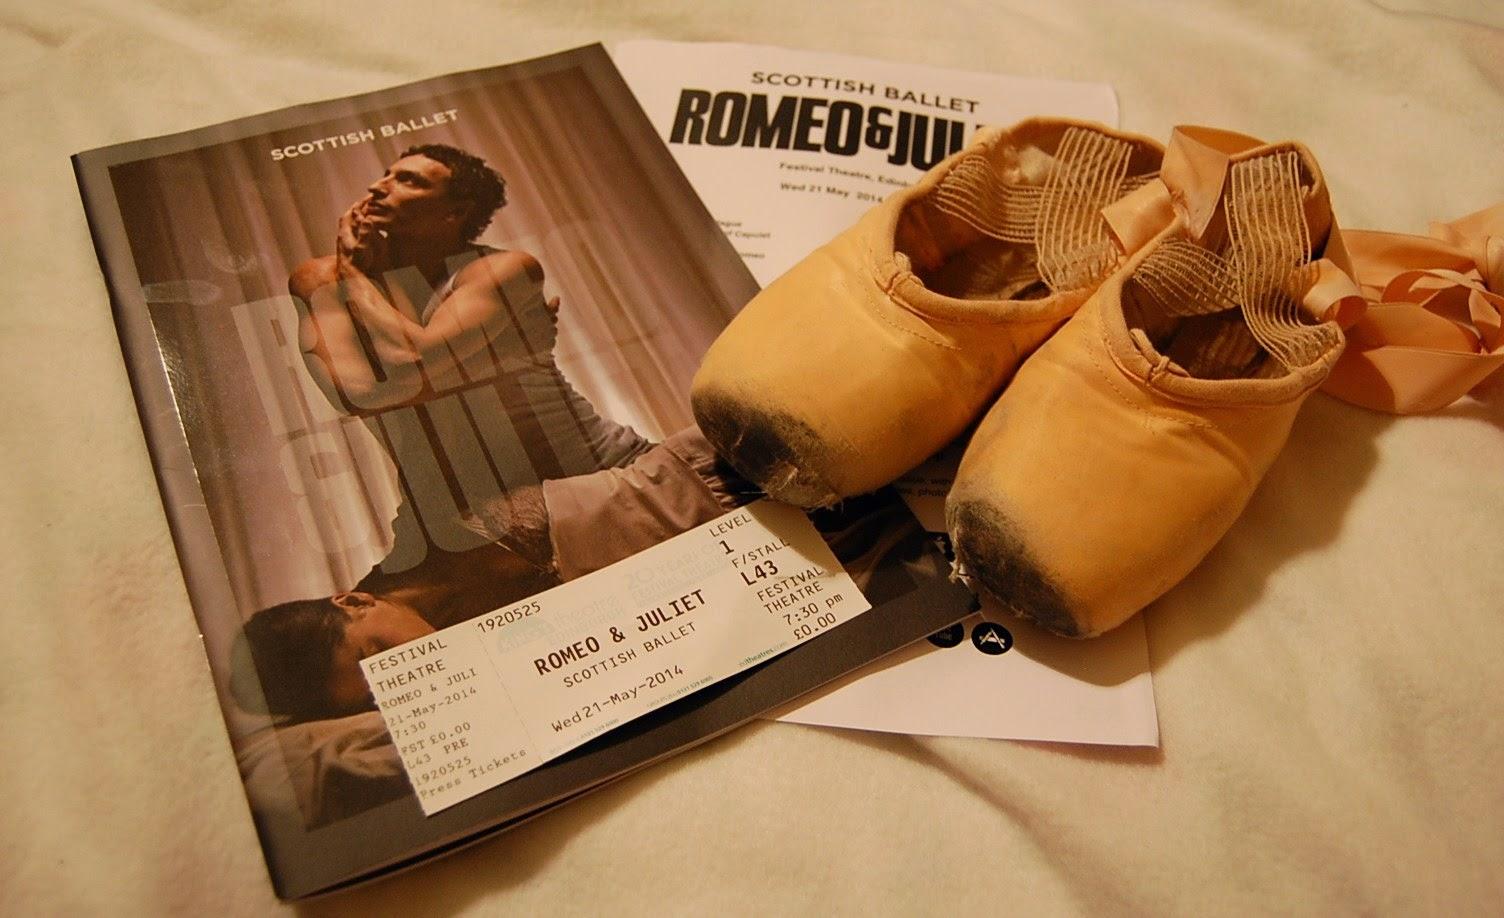 Scottish Ballet's Romeo and Juliet